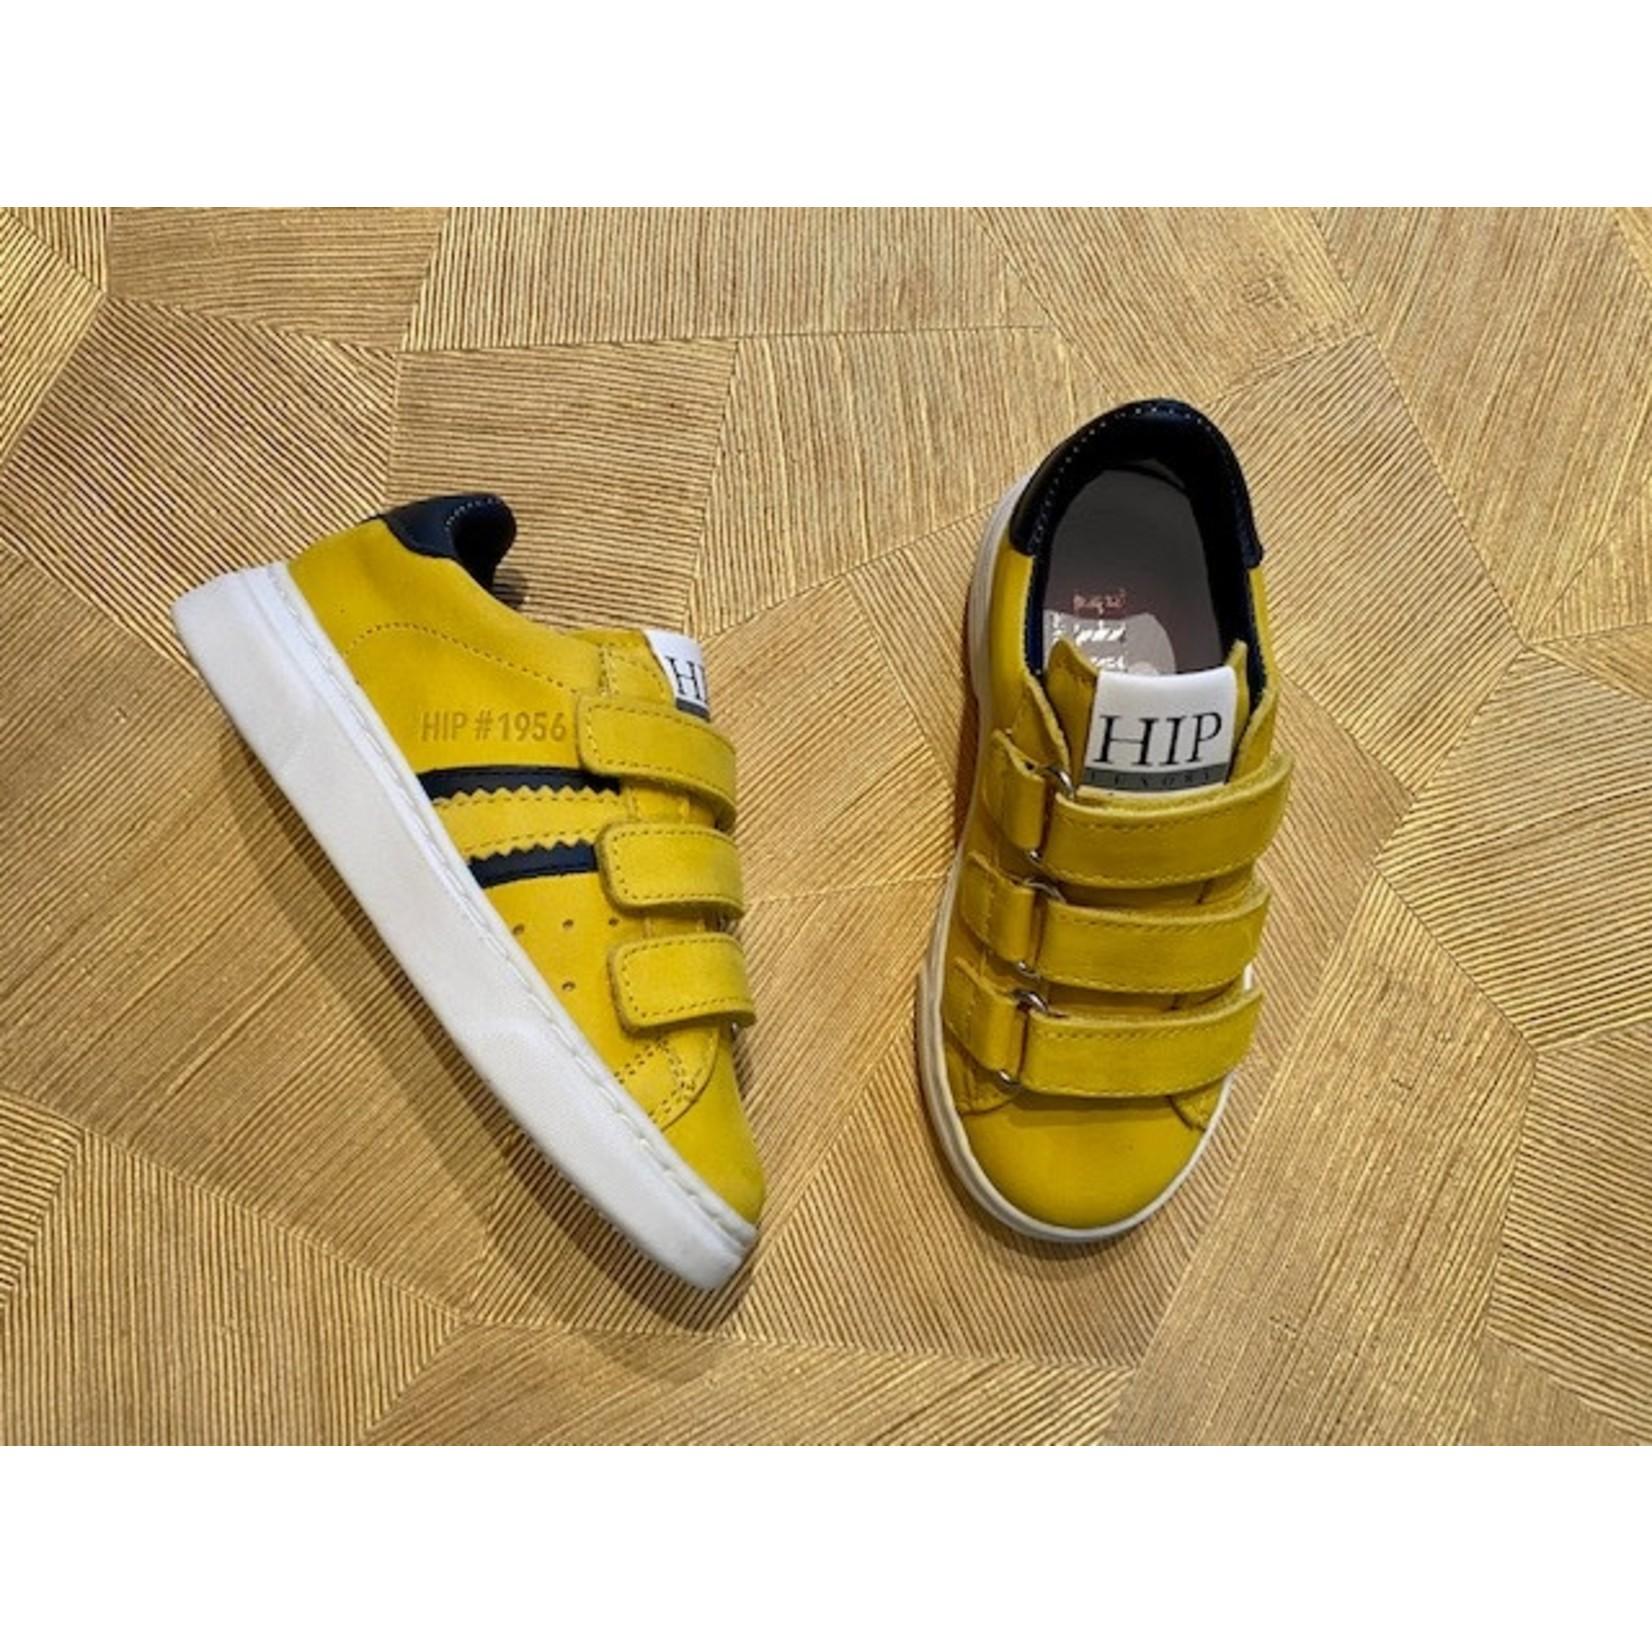 HIP HIP NEW sneaker YELLOW